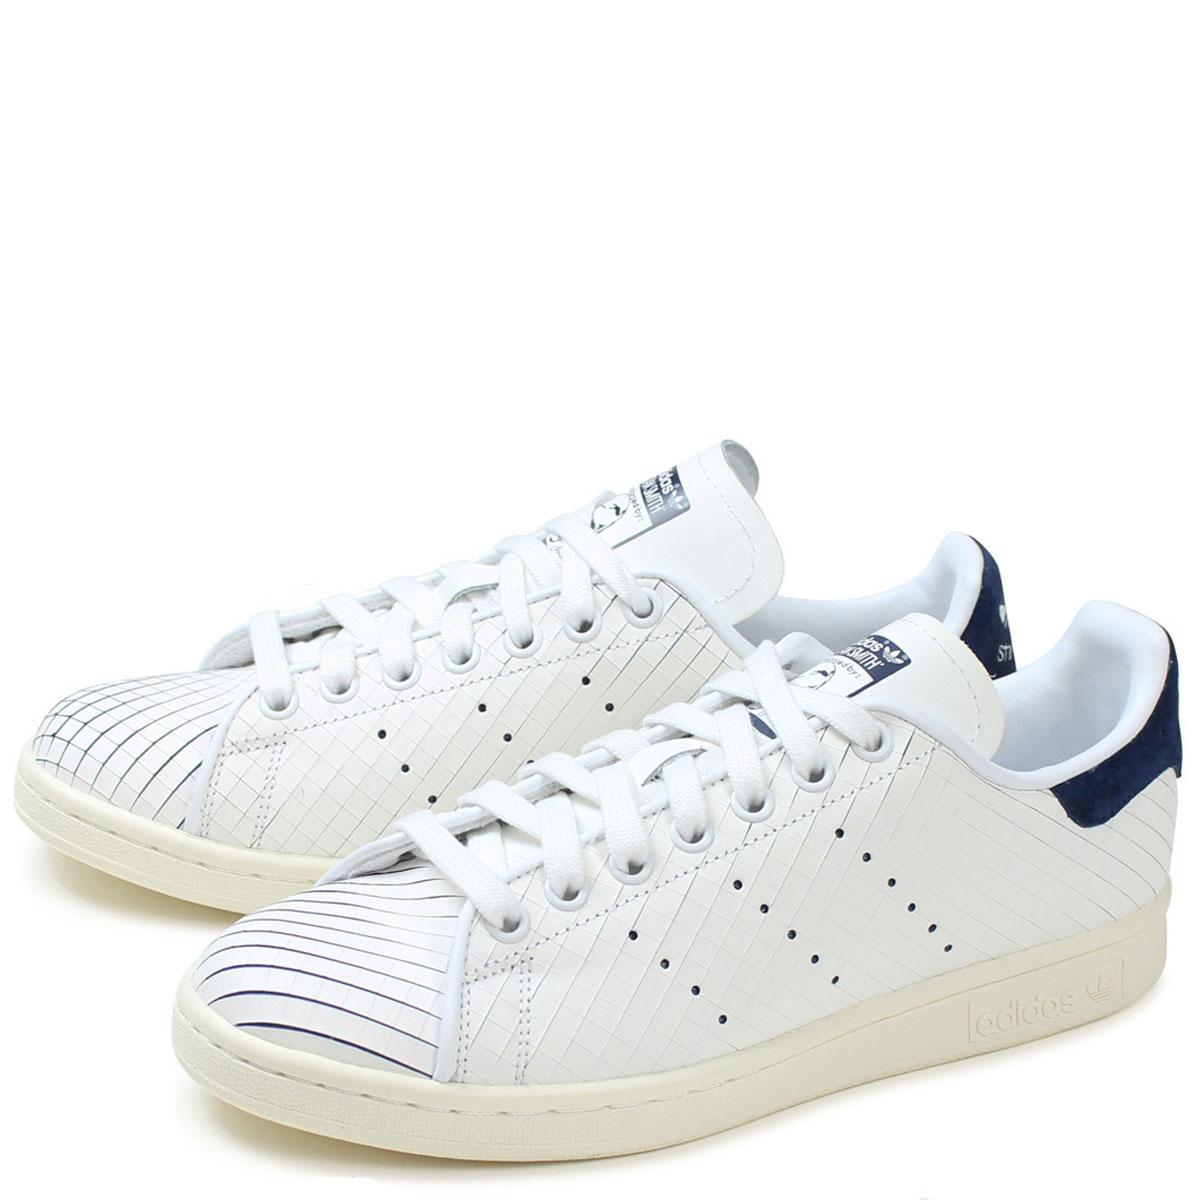 new arrival f4d76 aea92 Adidas originals adidas Originals SUPERSTAR 2 sneakers Super Star 2 leather  mens G17068 WHITE BLACK White x black  regular